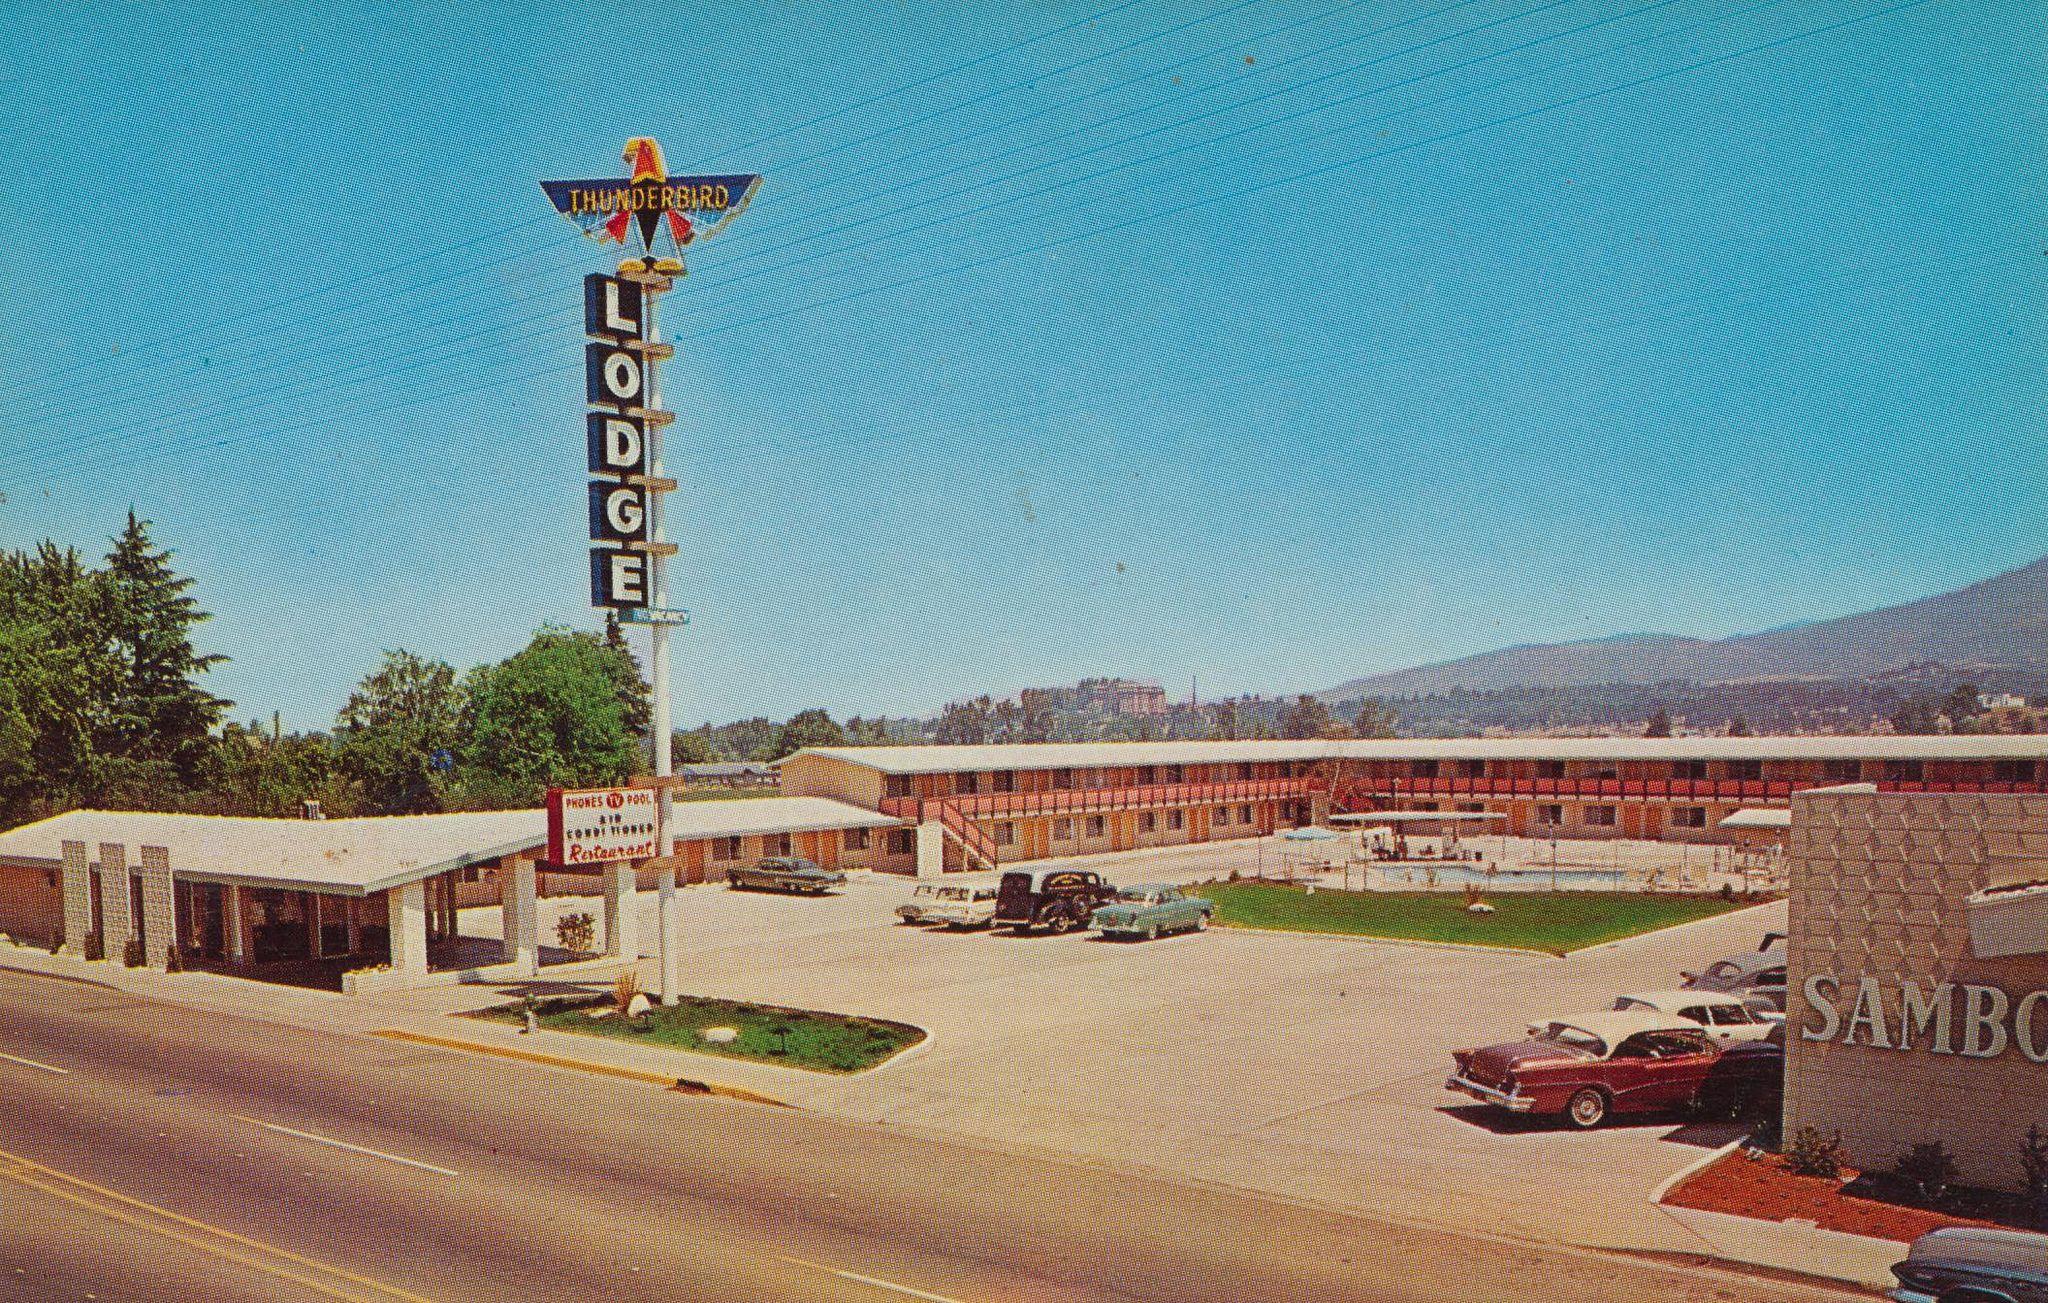 Thunderbird Lodge Medford, Oregon Jacksonville oregon